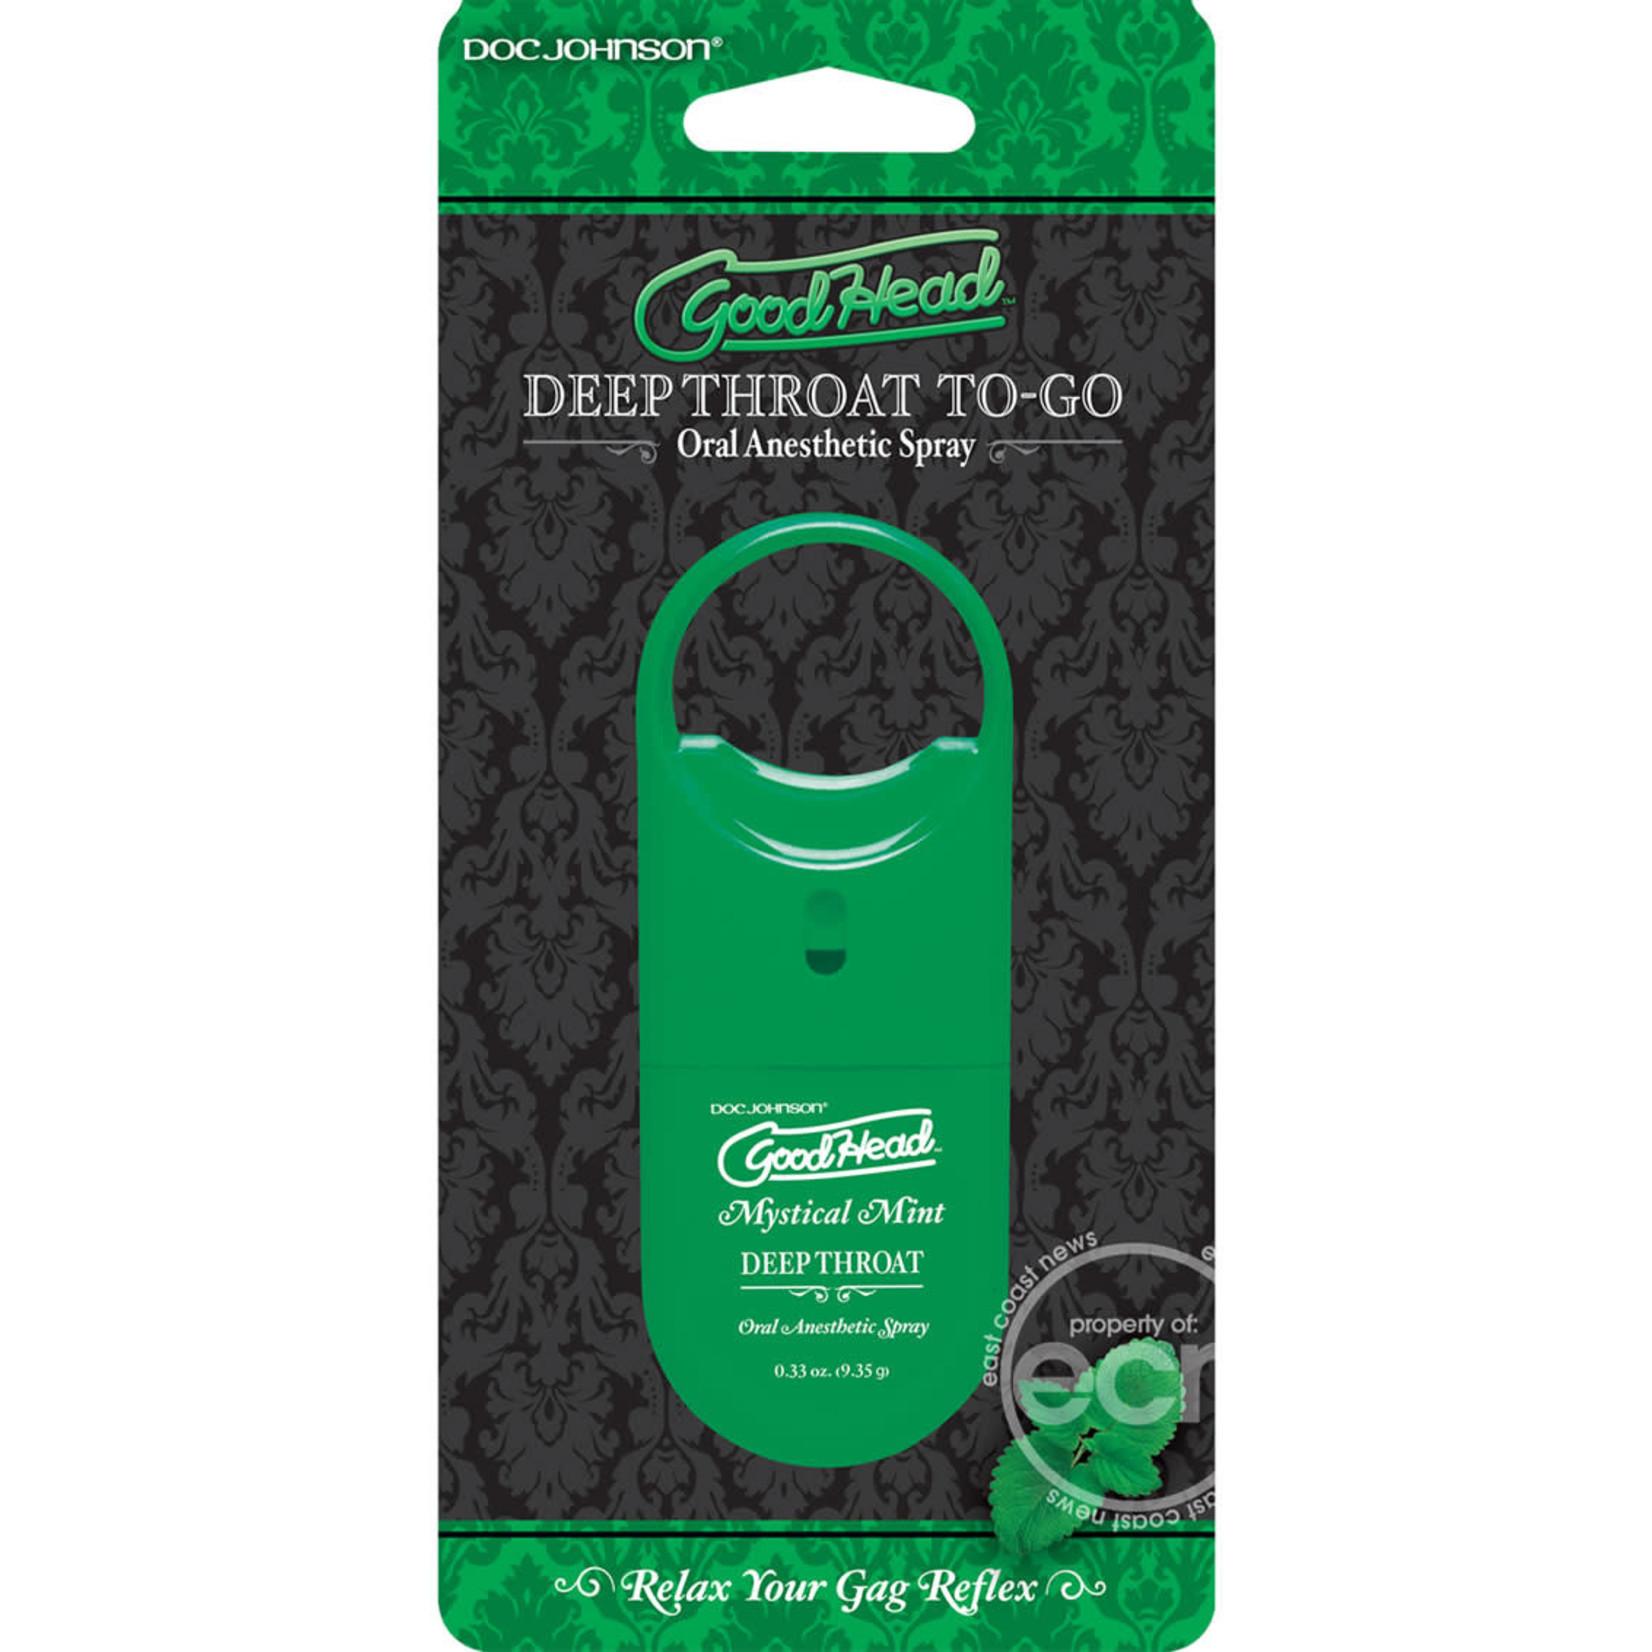 Goodhead Deep Throat To-Go Oral Anesthetic Spray Mint .33oz